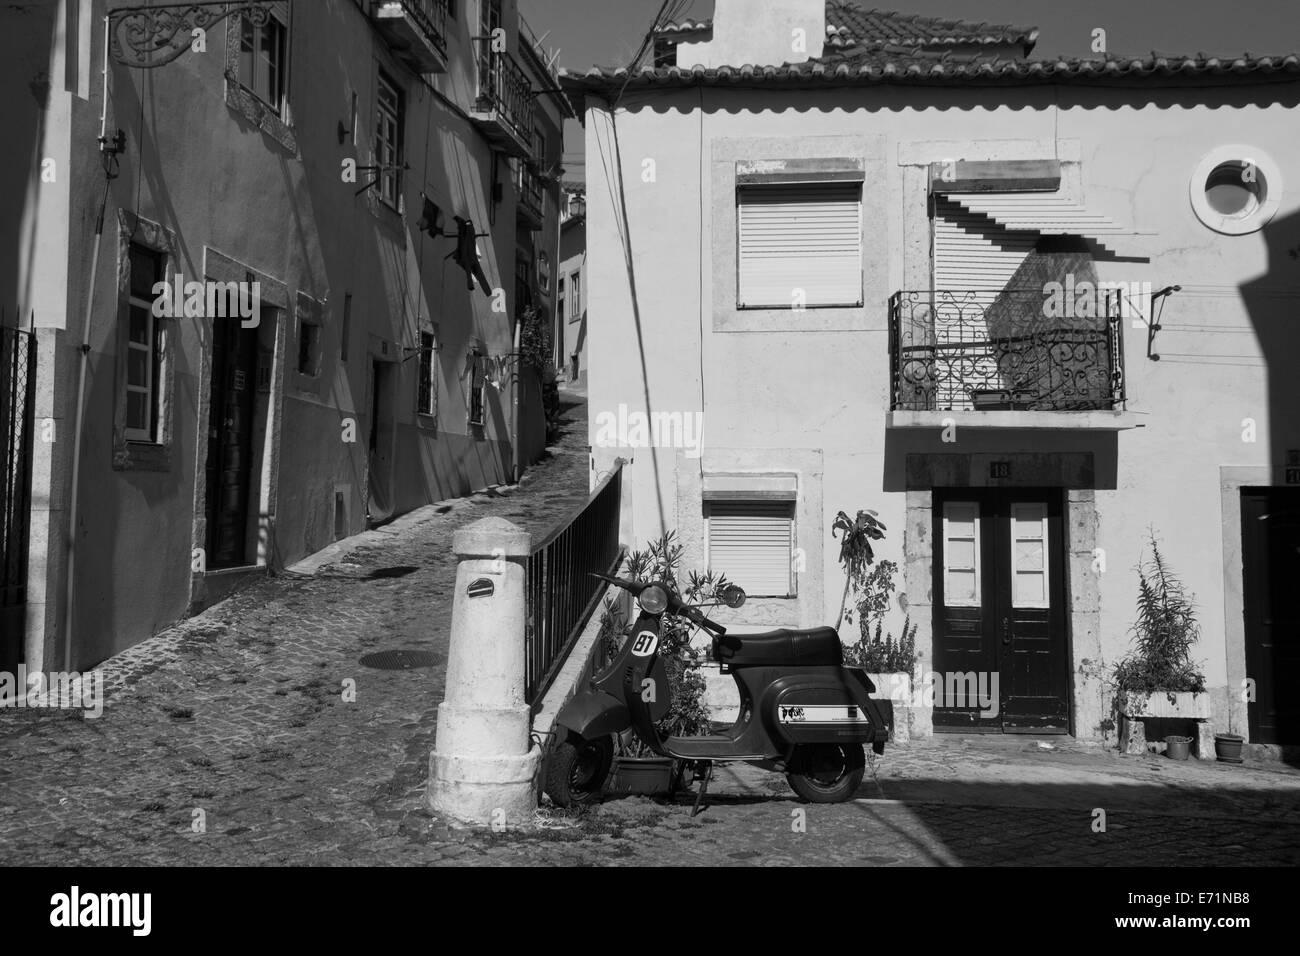 Streets of Alfama, Lisbon, Portugal - Stock Image